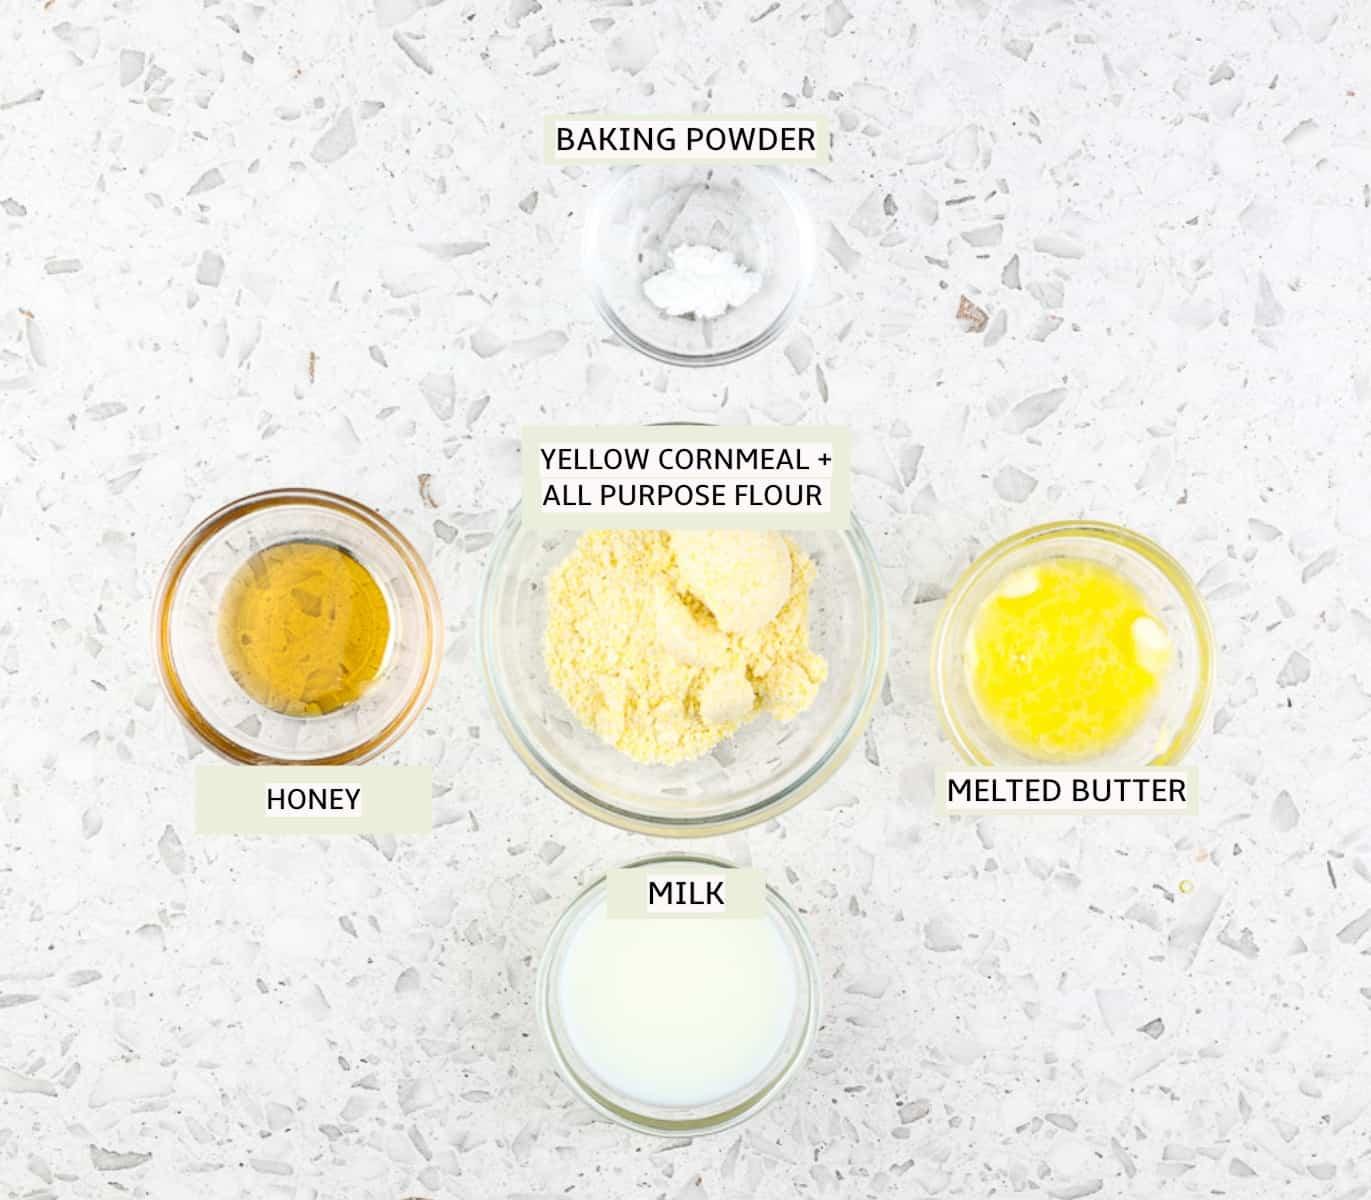 Ingredients to make cornbread.